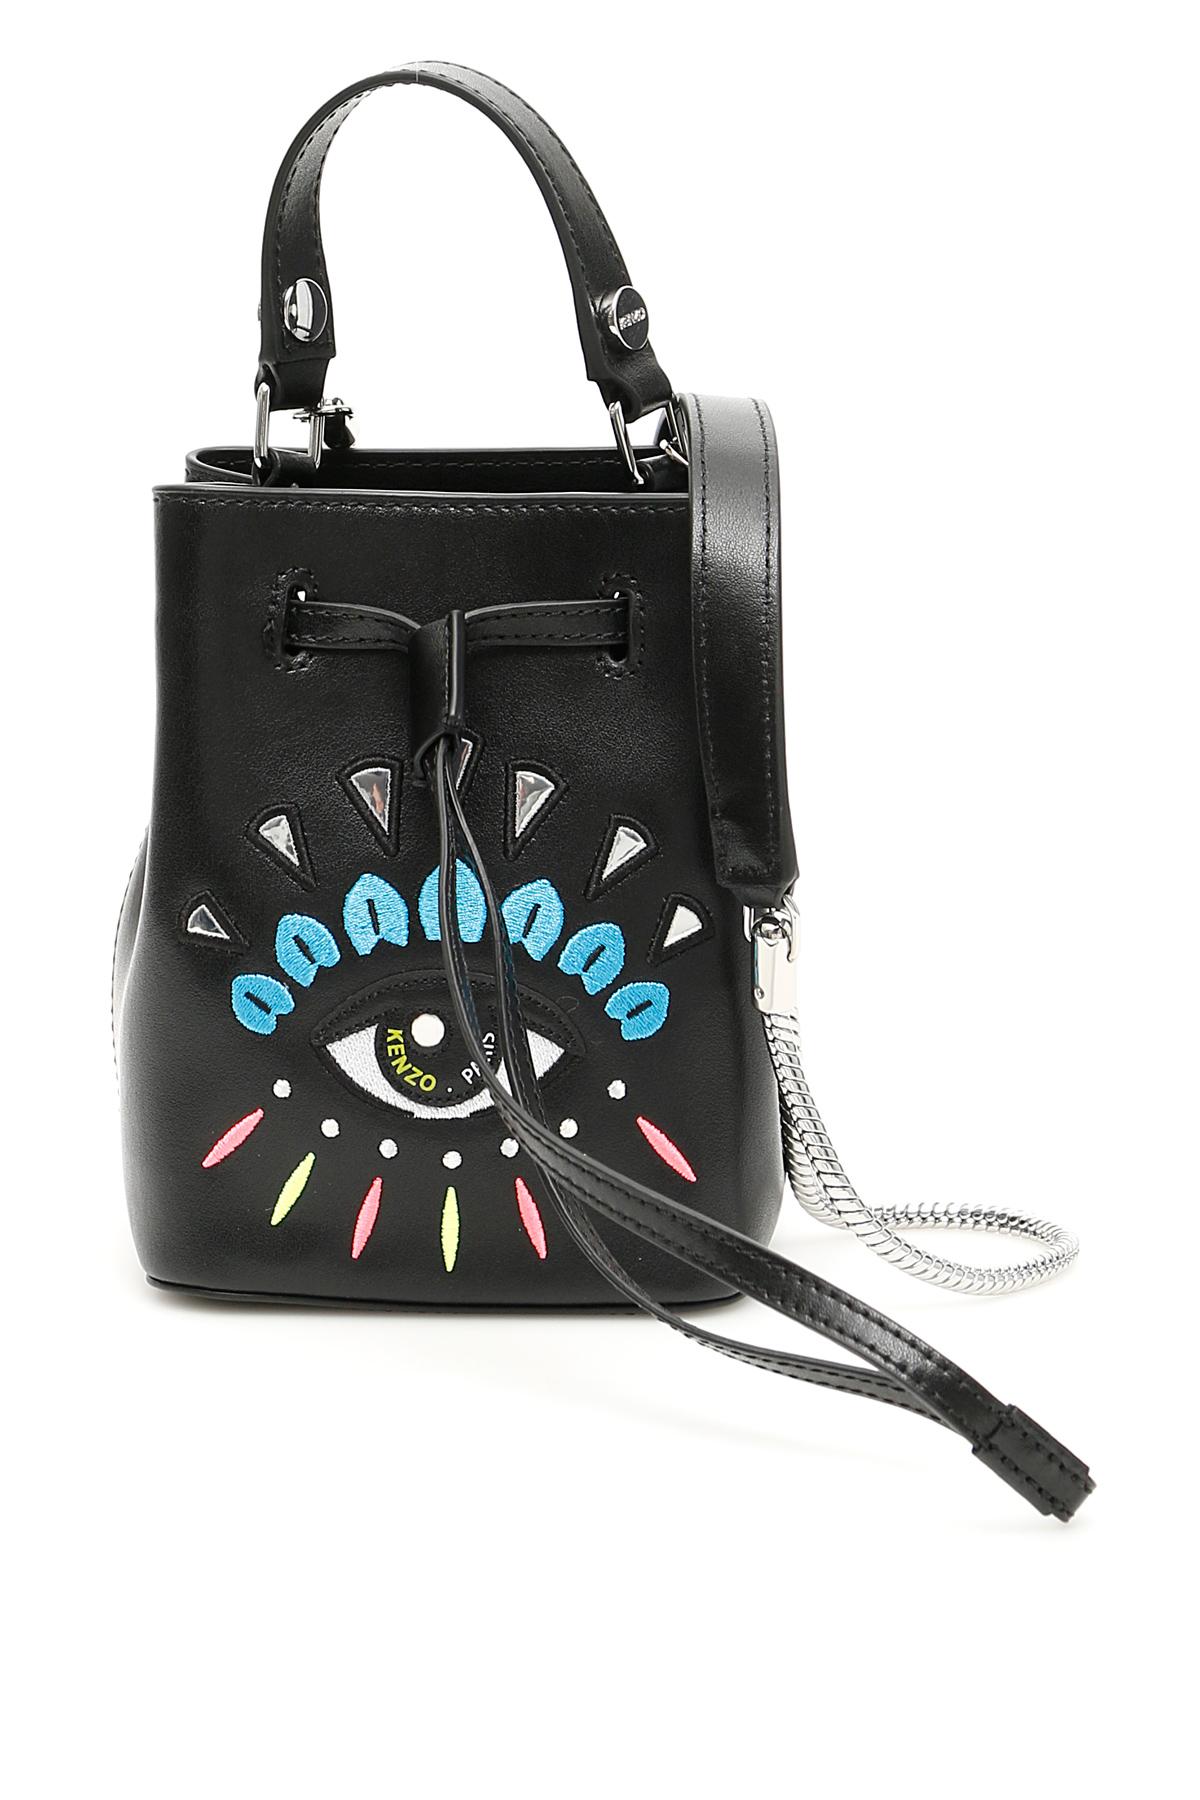 6743c696b8c Product Information. 295,00€. Kenzo leather bucket bag with ...